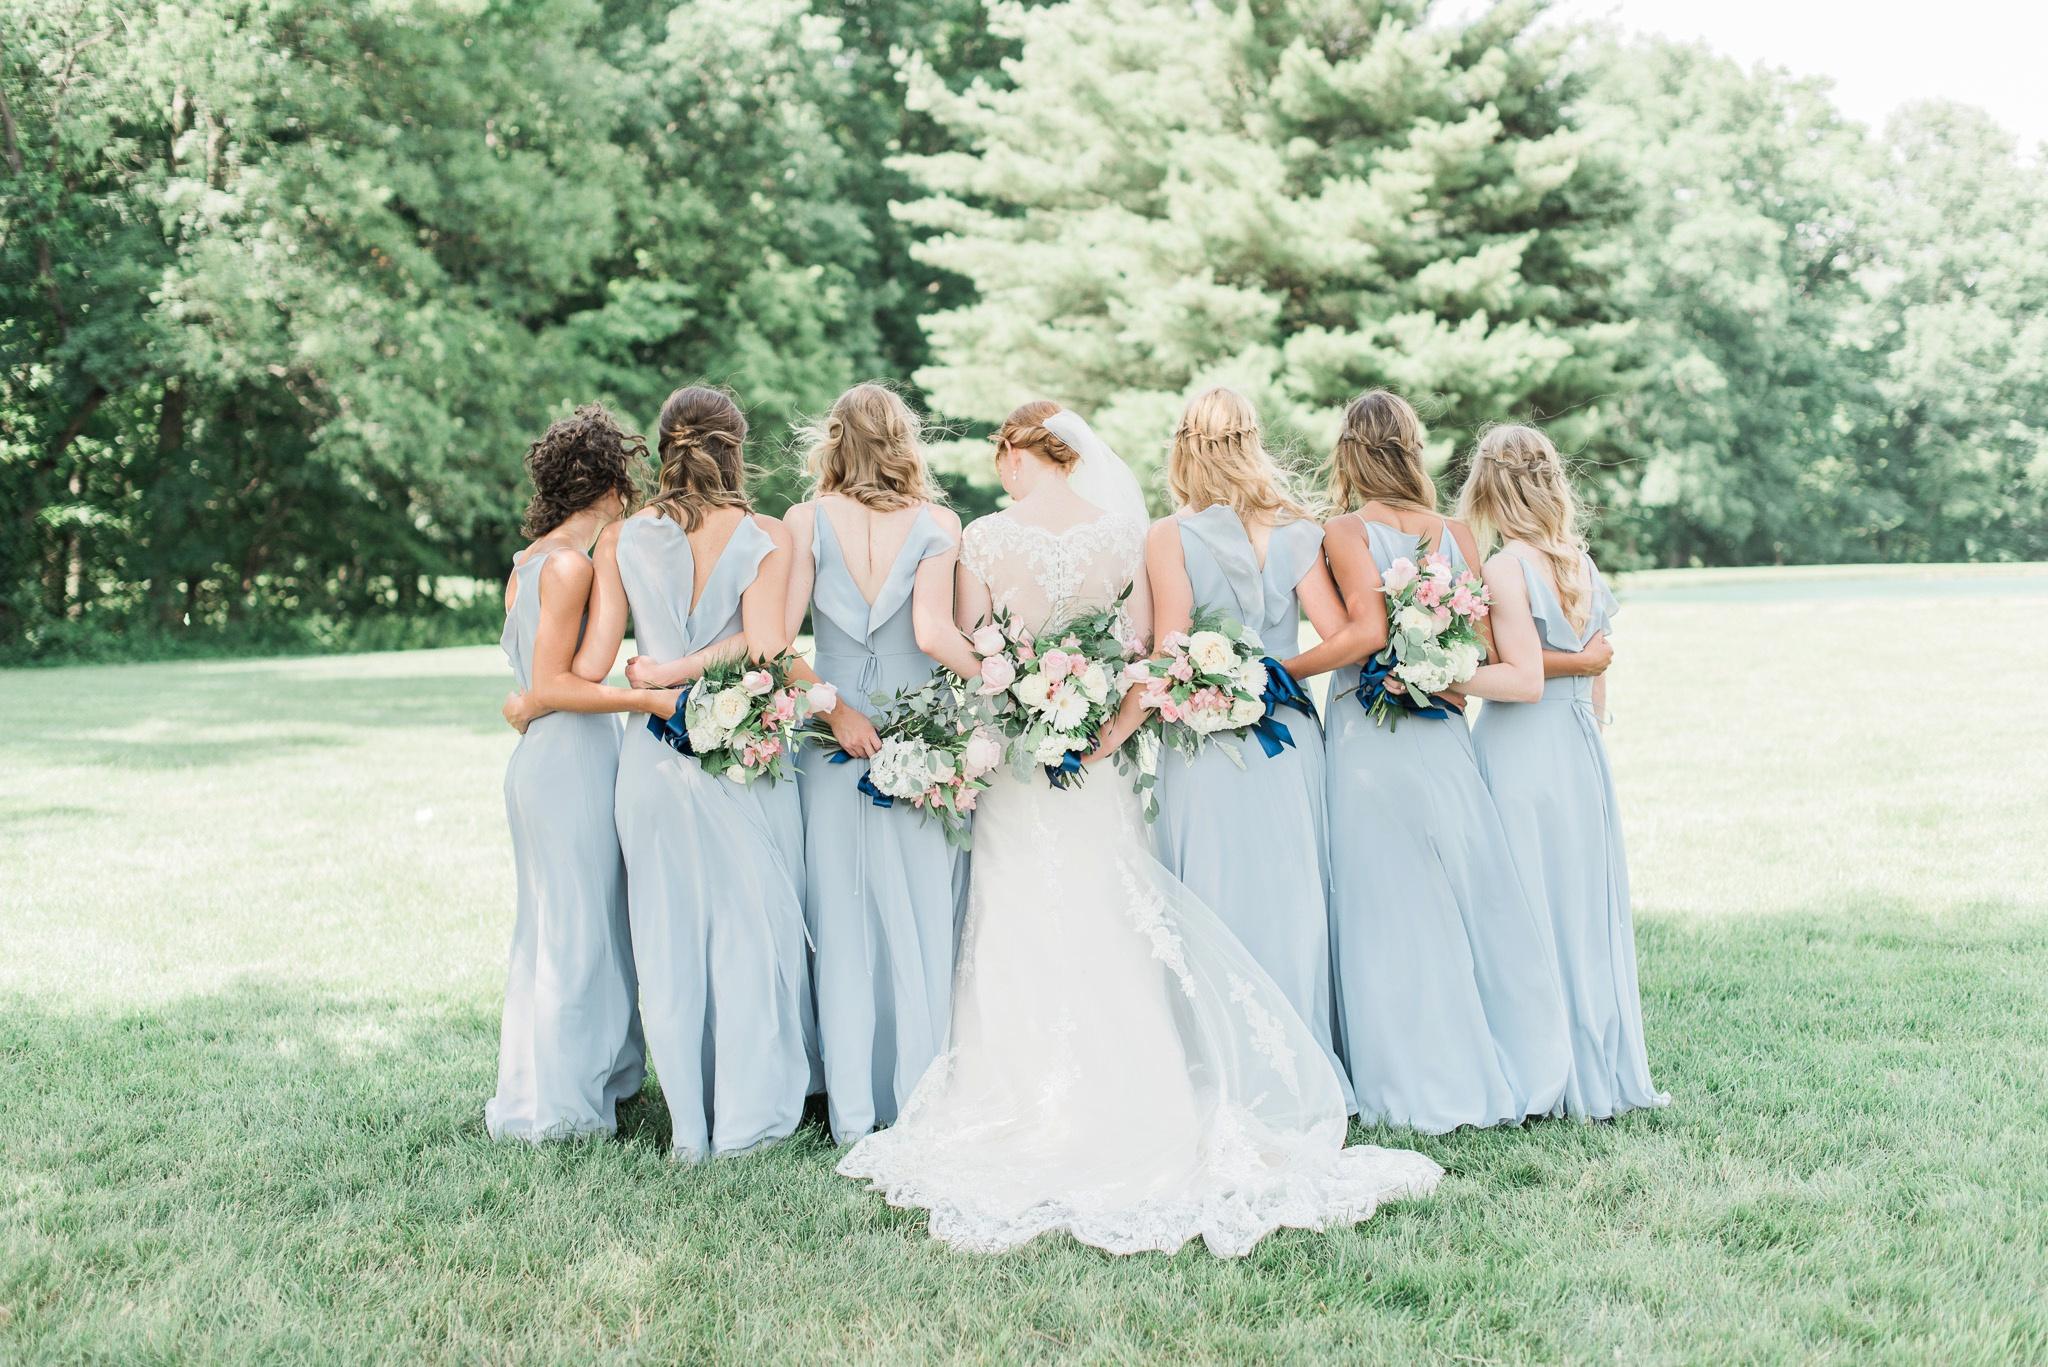 sunbury-ohio-wedding-hannah-johnathan_0040.jpg